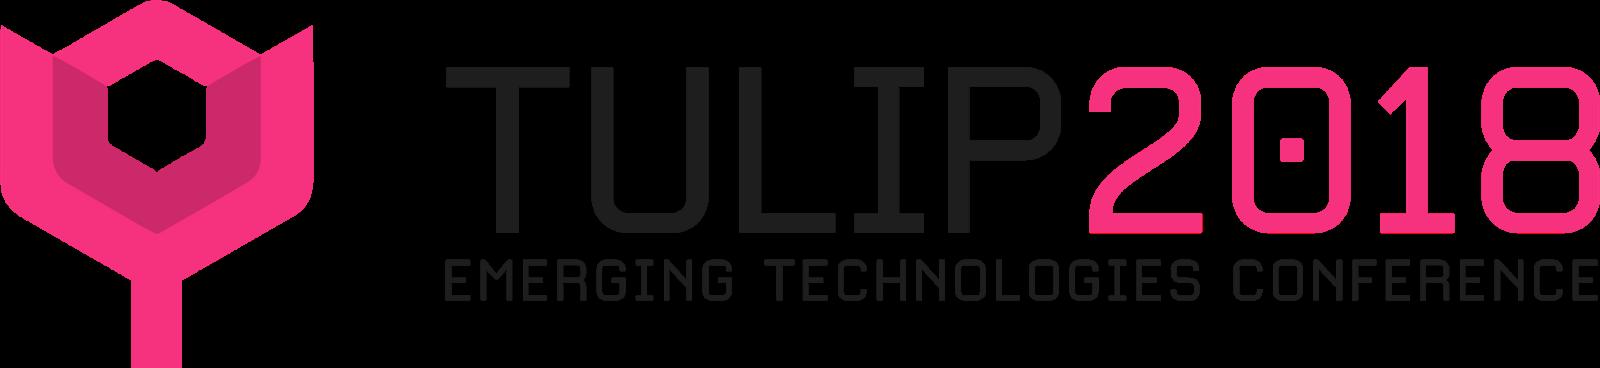 /tulip2018-next-gen-blockchain-conference-june-7-8-in-san-francisco-66fdf2d4c366 feature image